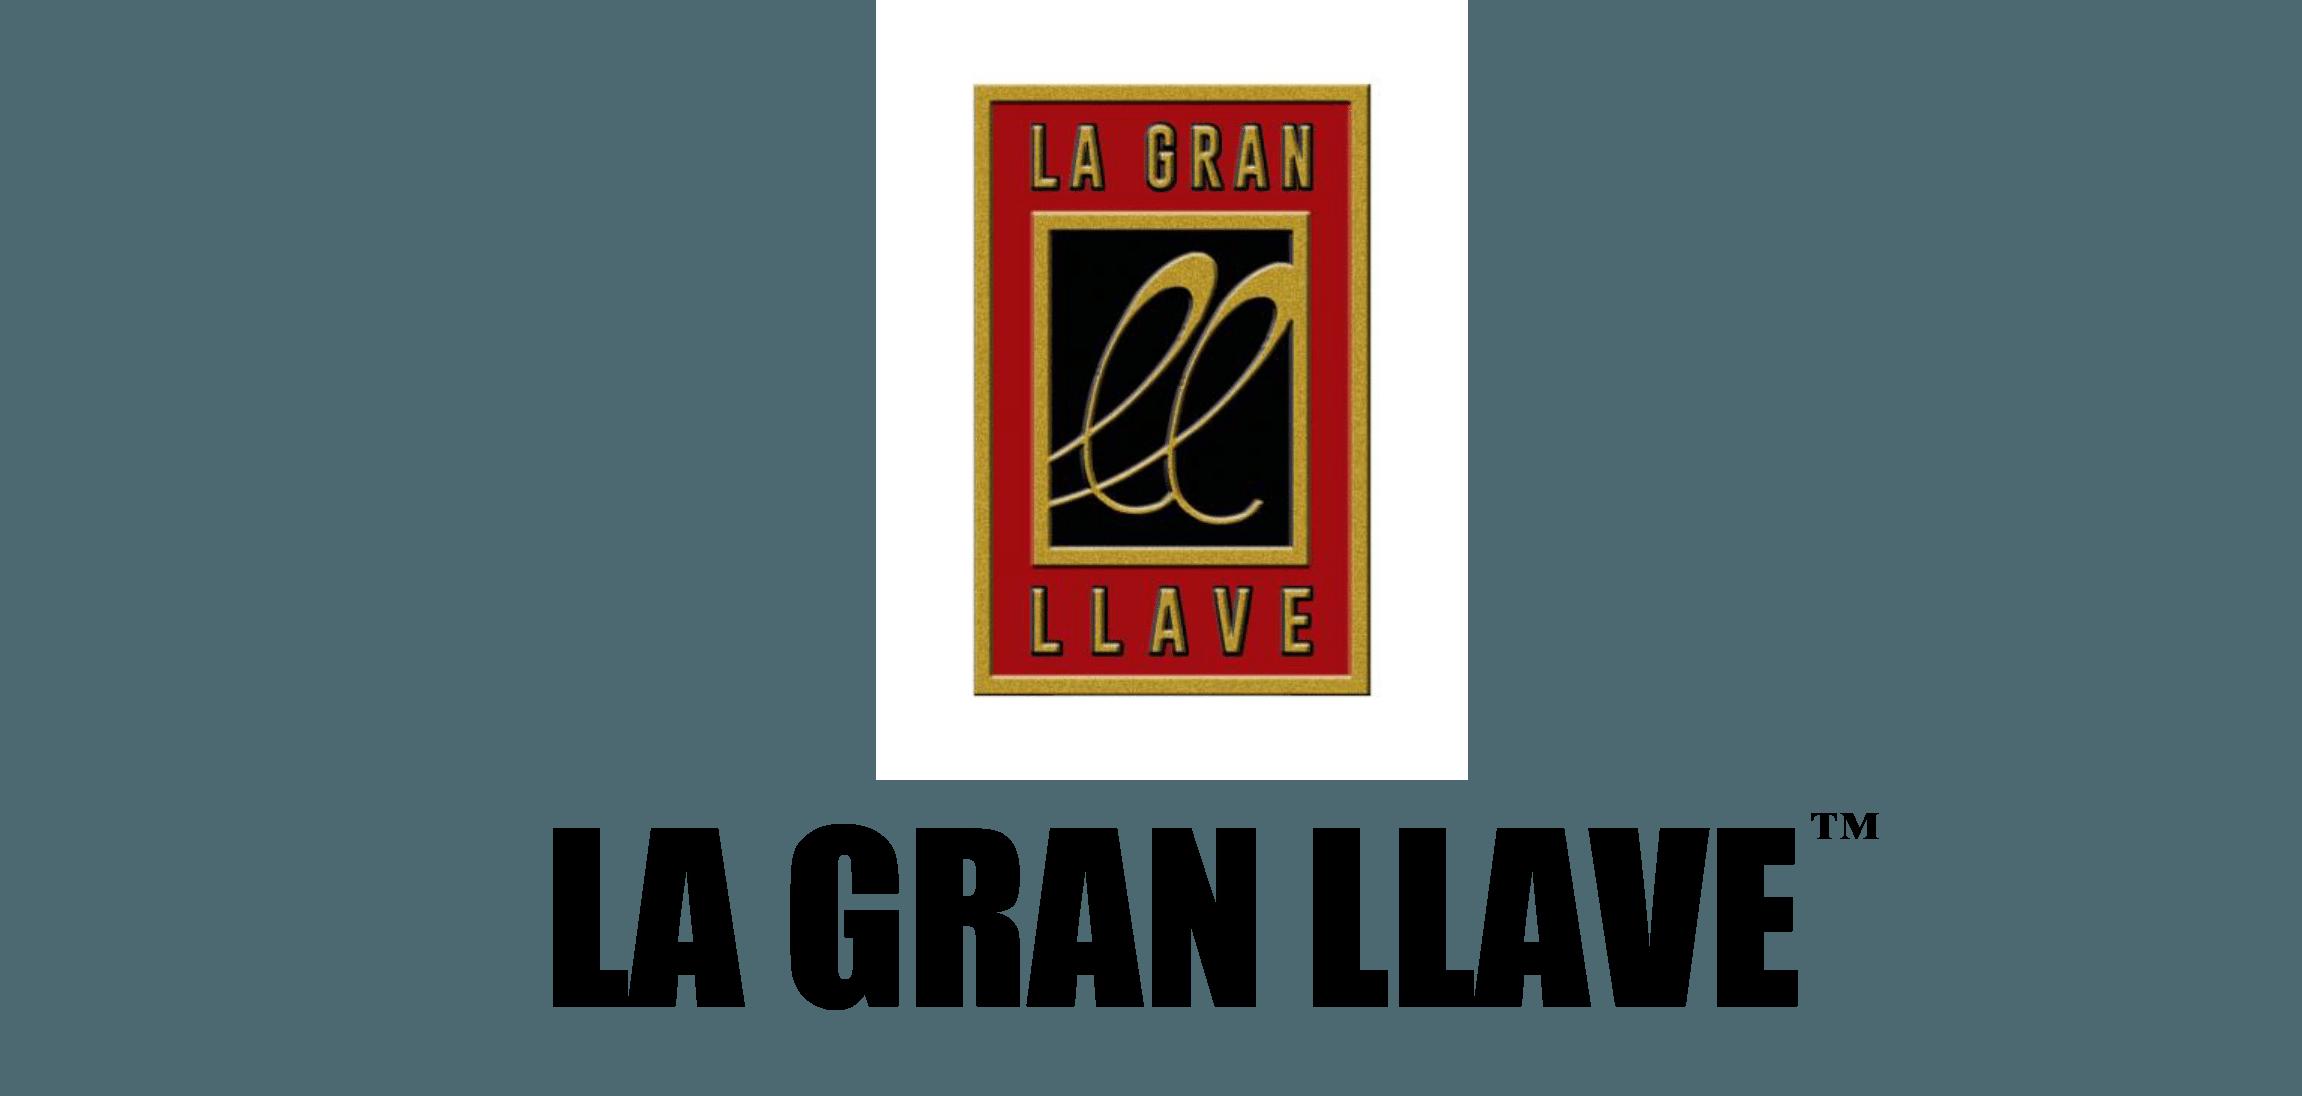 Cigar News: Michael Argenti Announces LA GRAN LLAVE